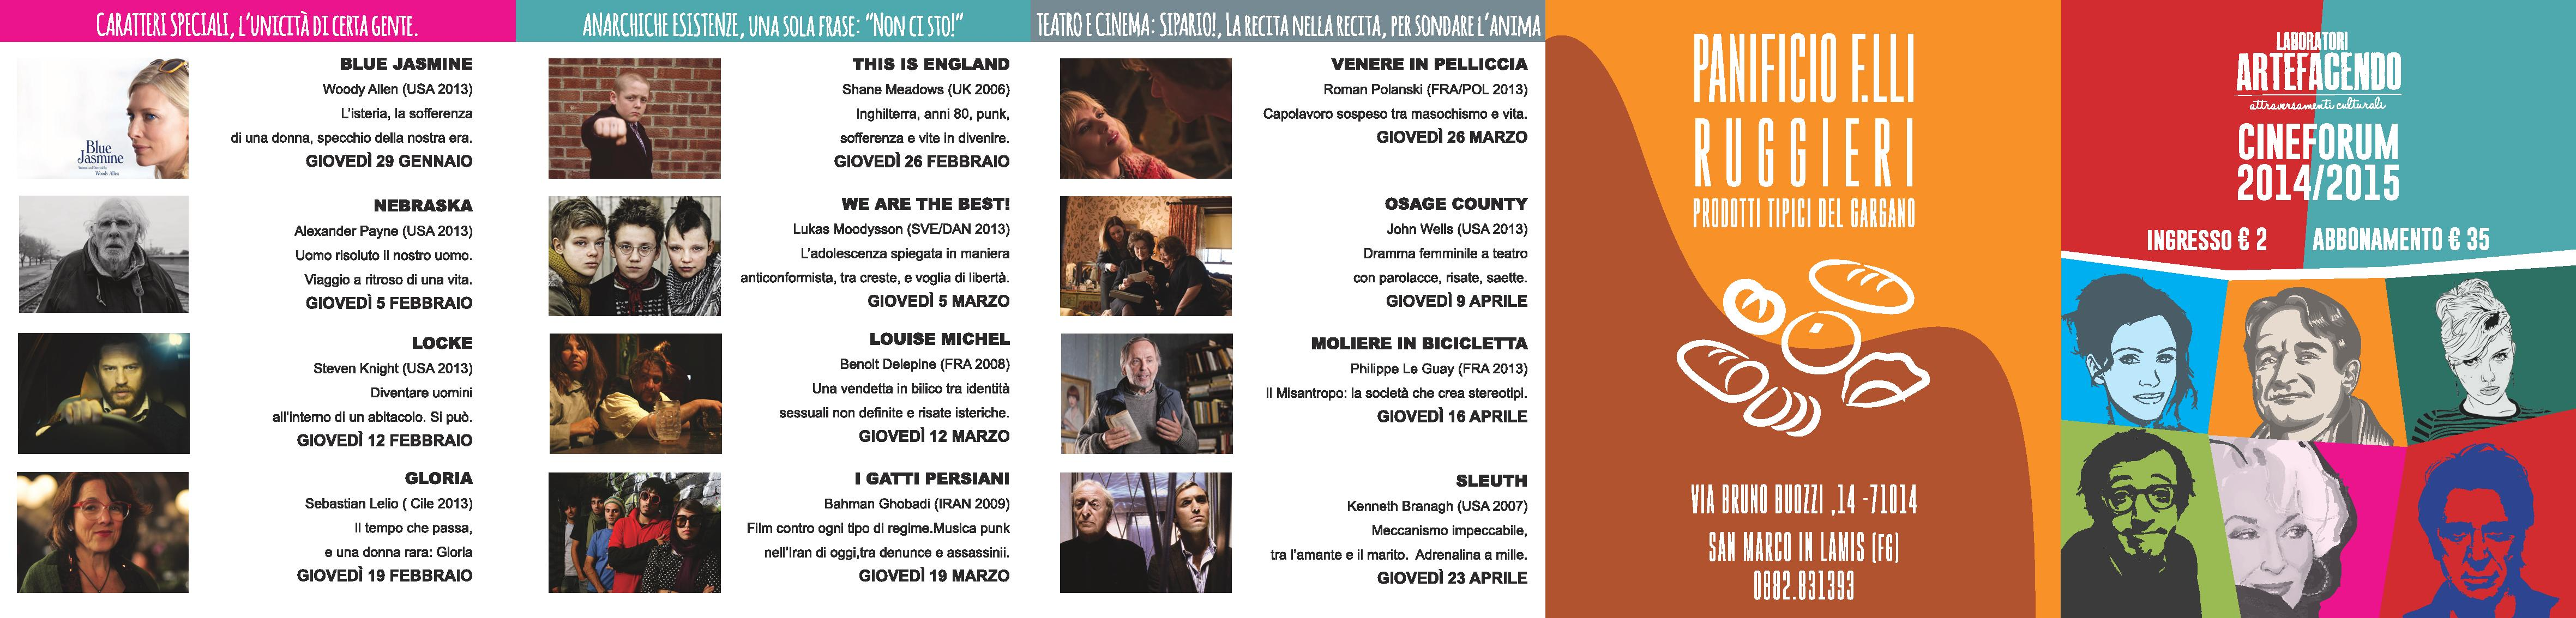 cineforum 2014-2015-page-001